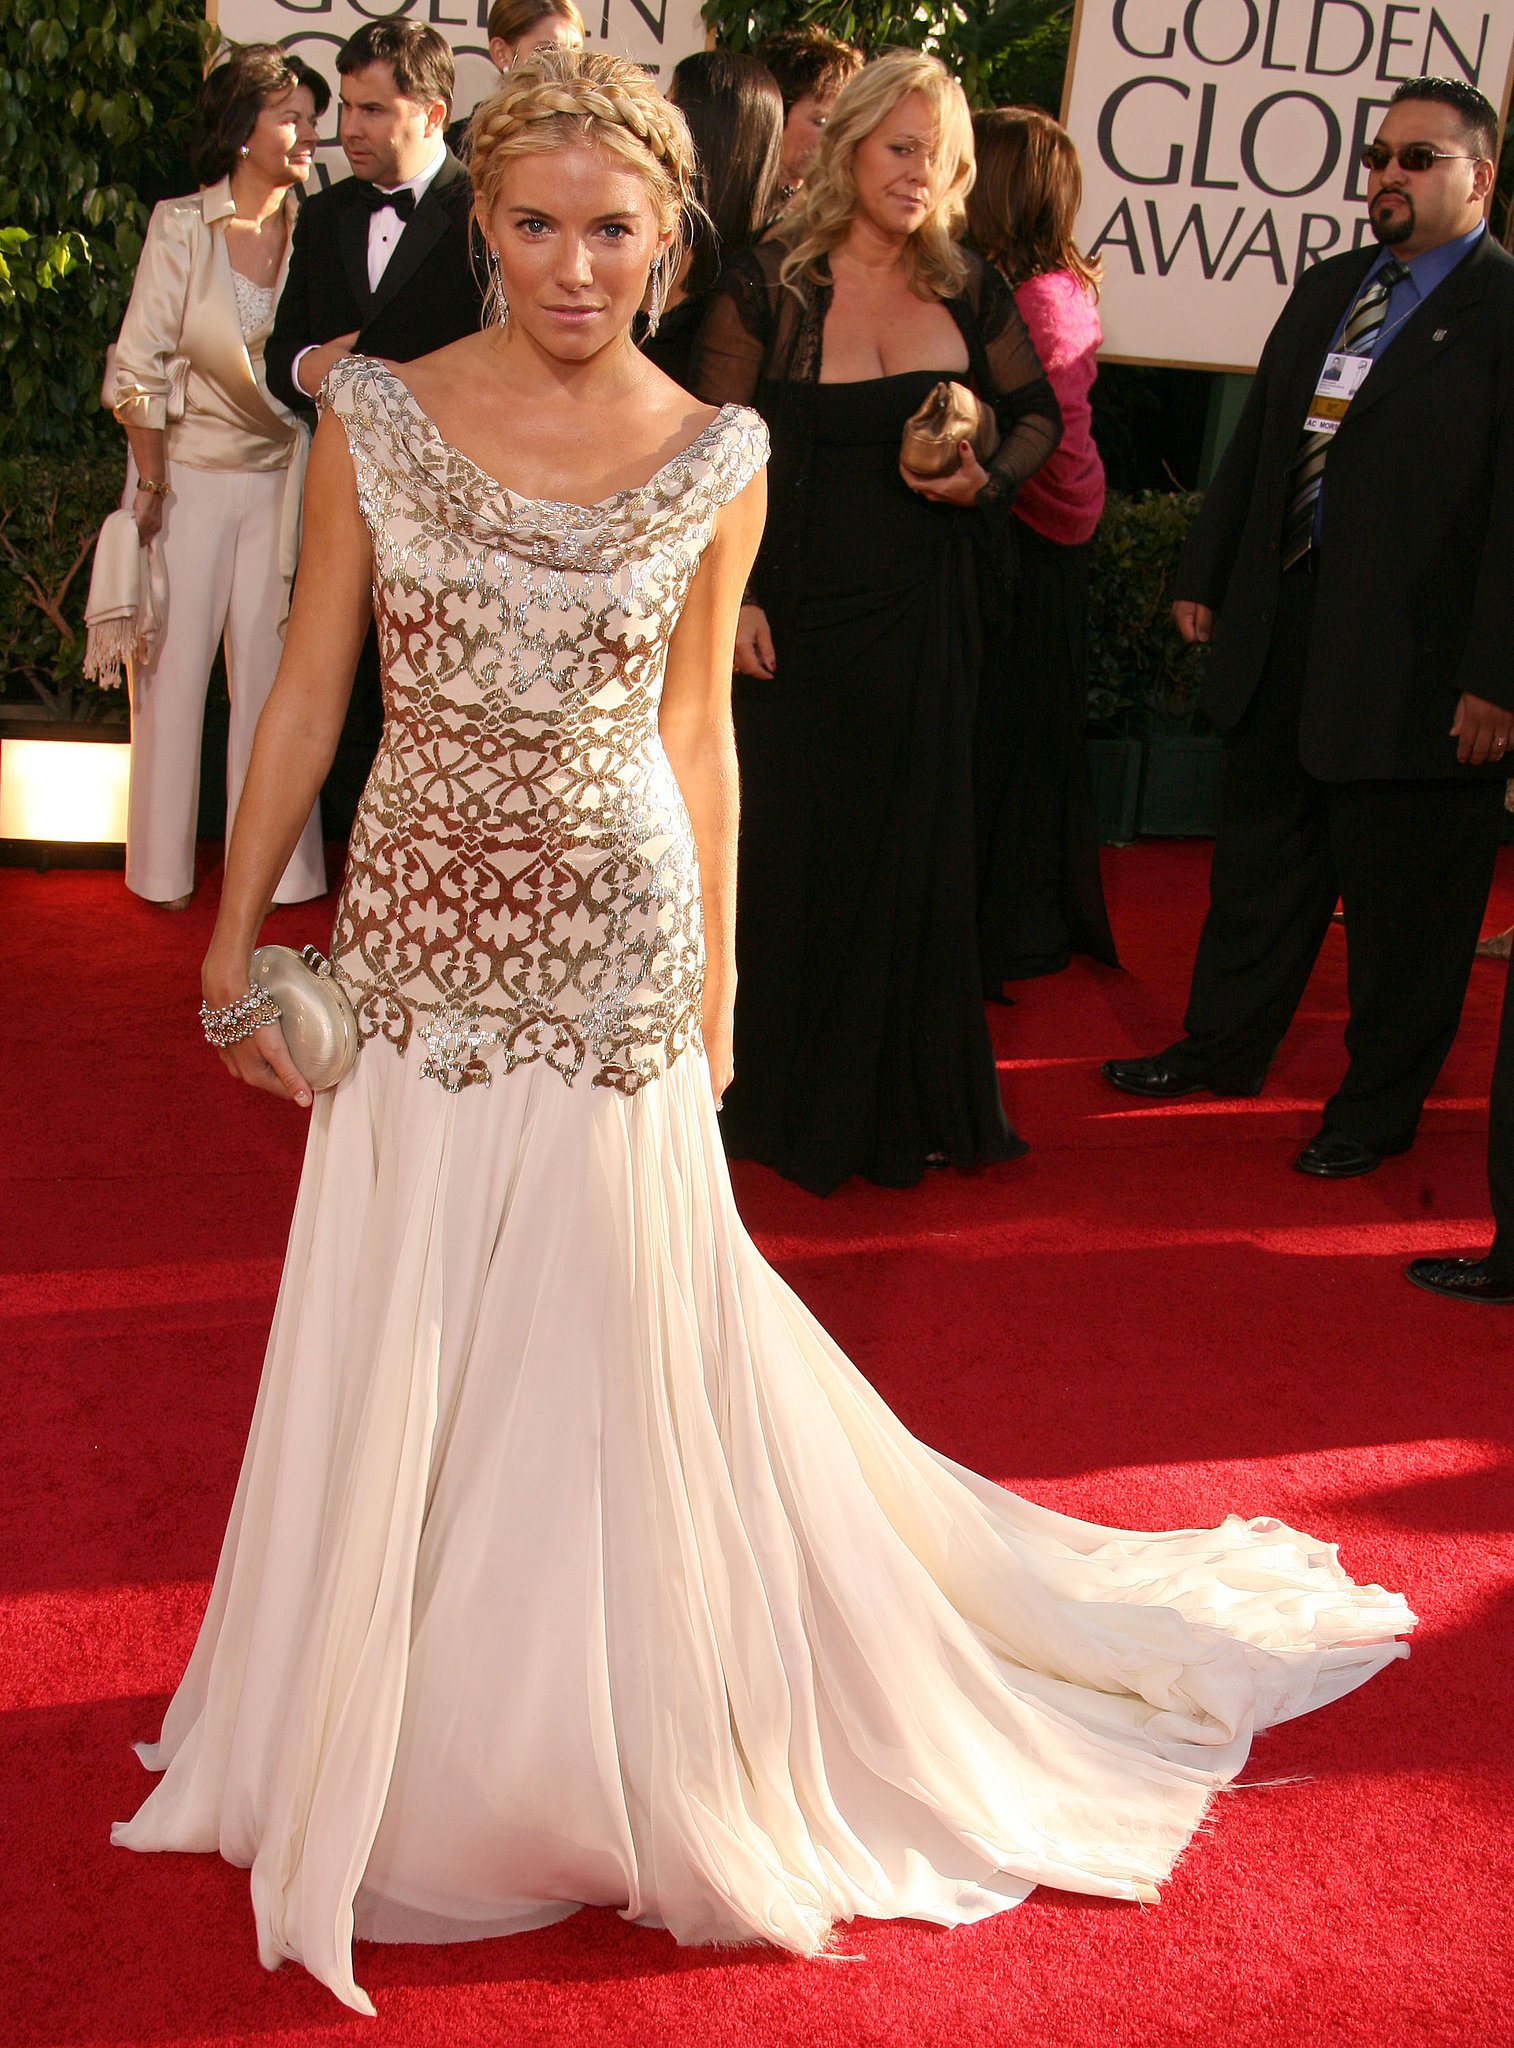 She had a princess moment at the 2007 Golden Globe Awards.